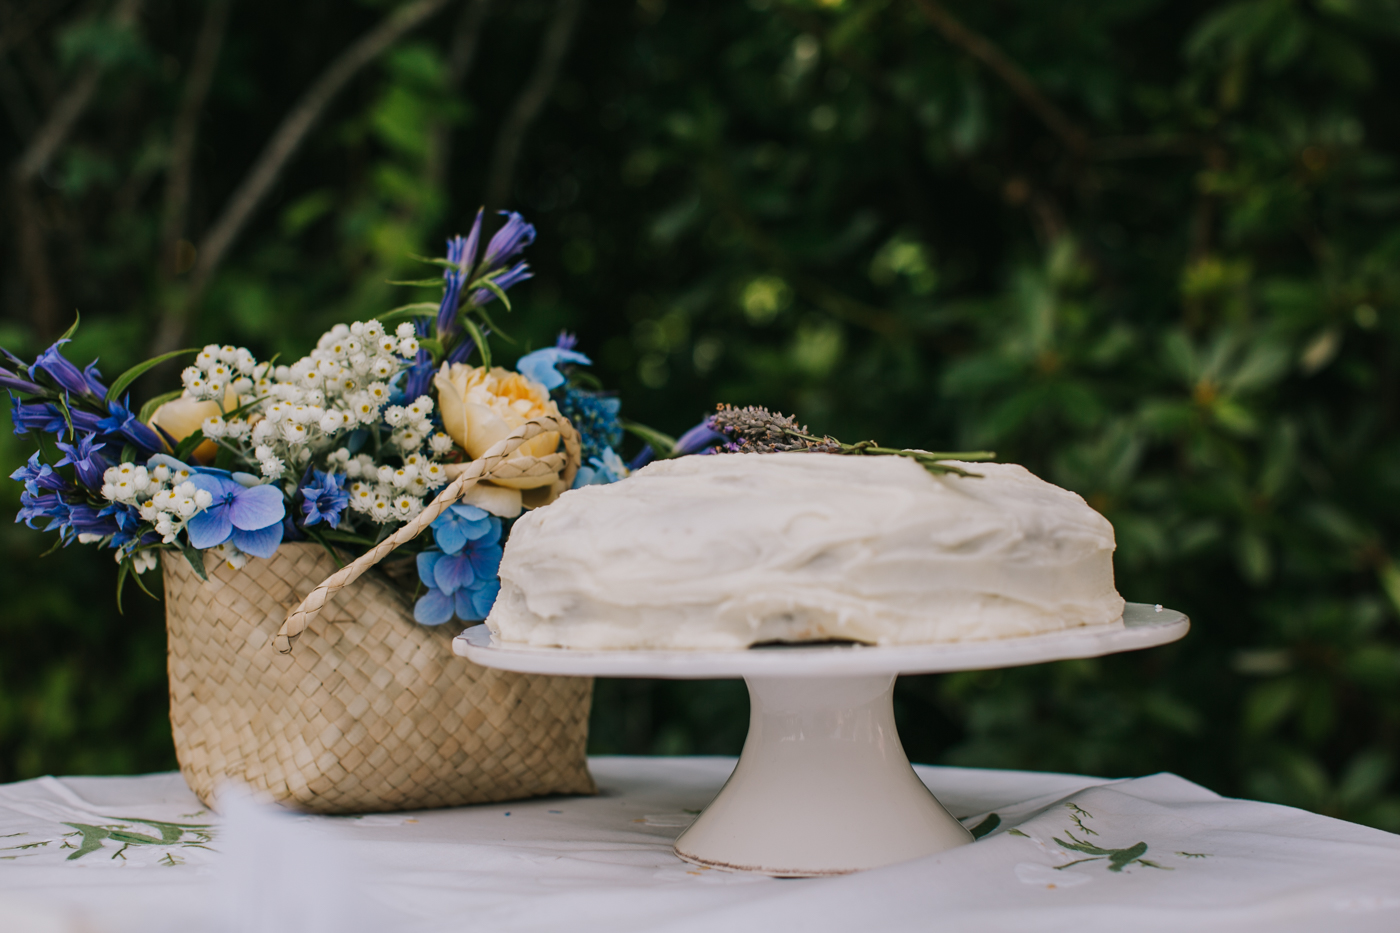 Ariana & Tim - Dunedin, New Zealand Wedding - Destination Wedding - Samantha Heather Photography-113.jpg